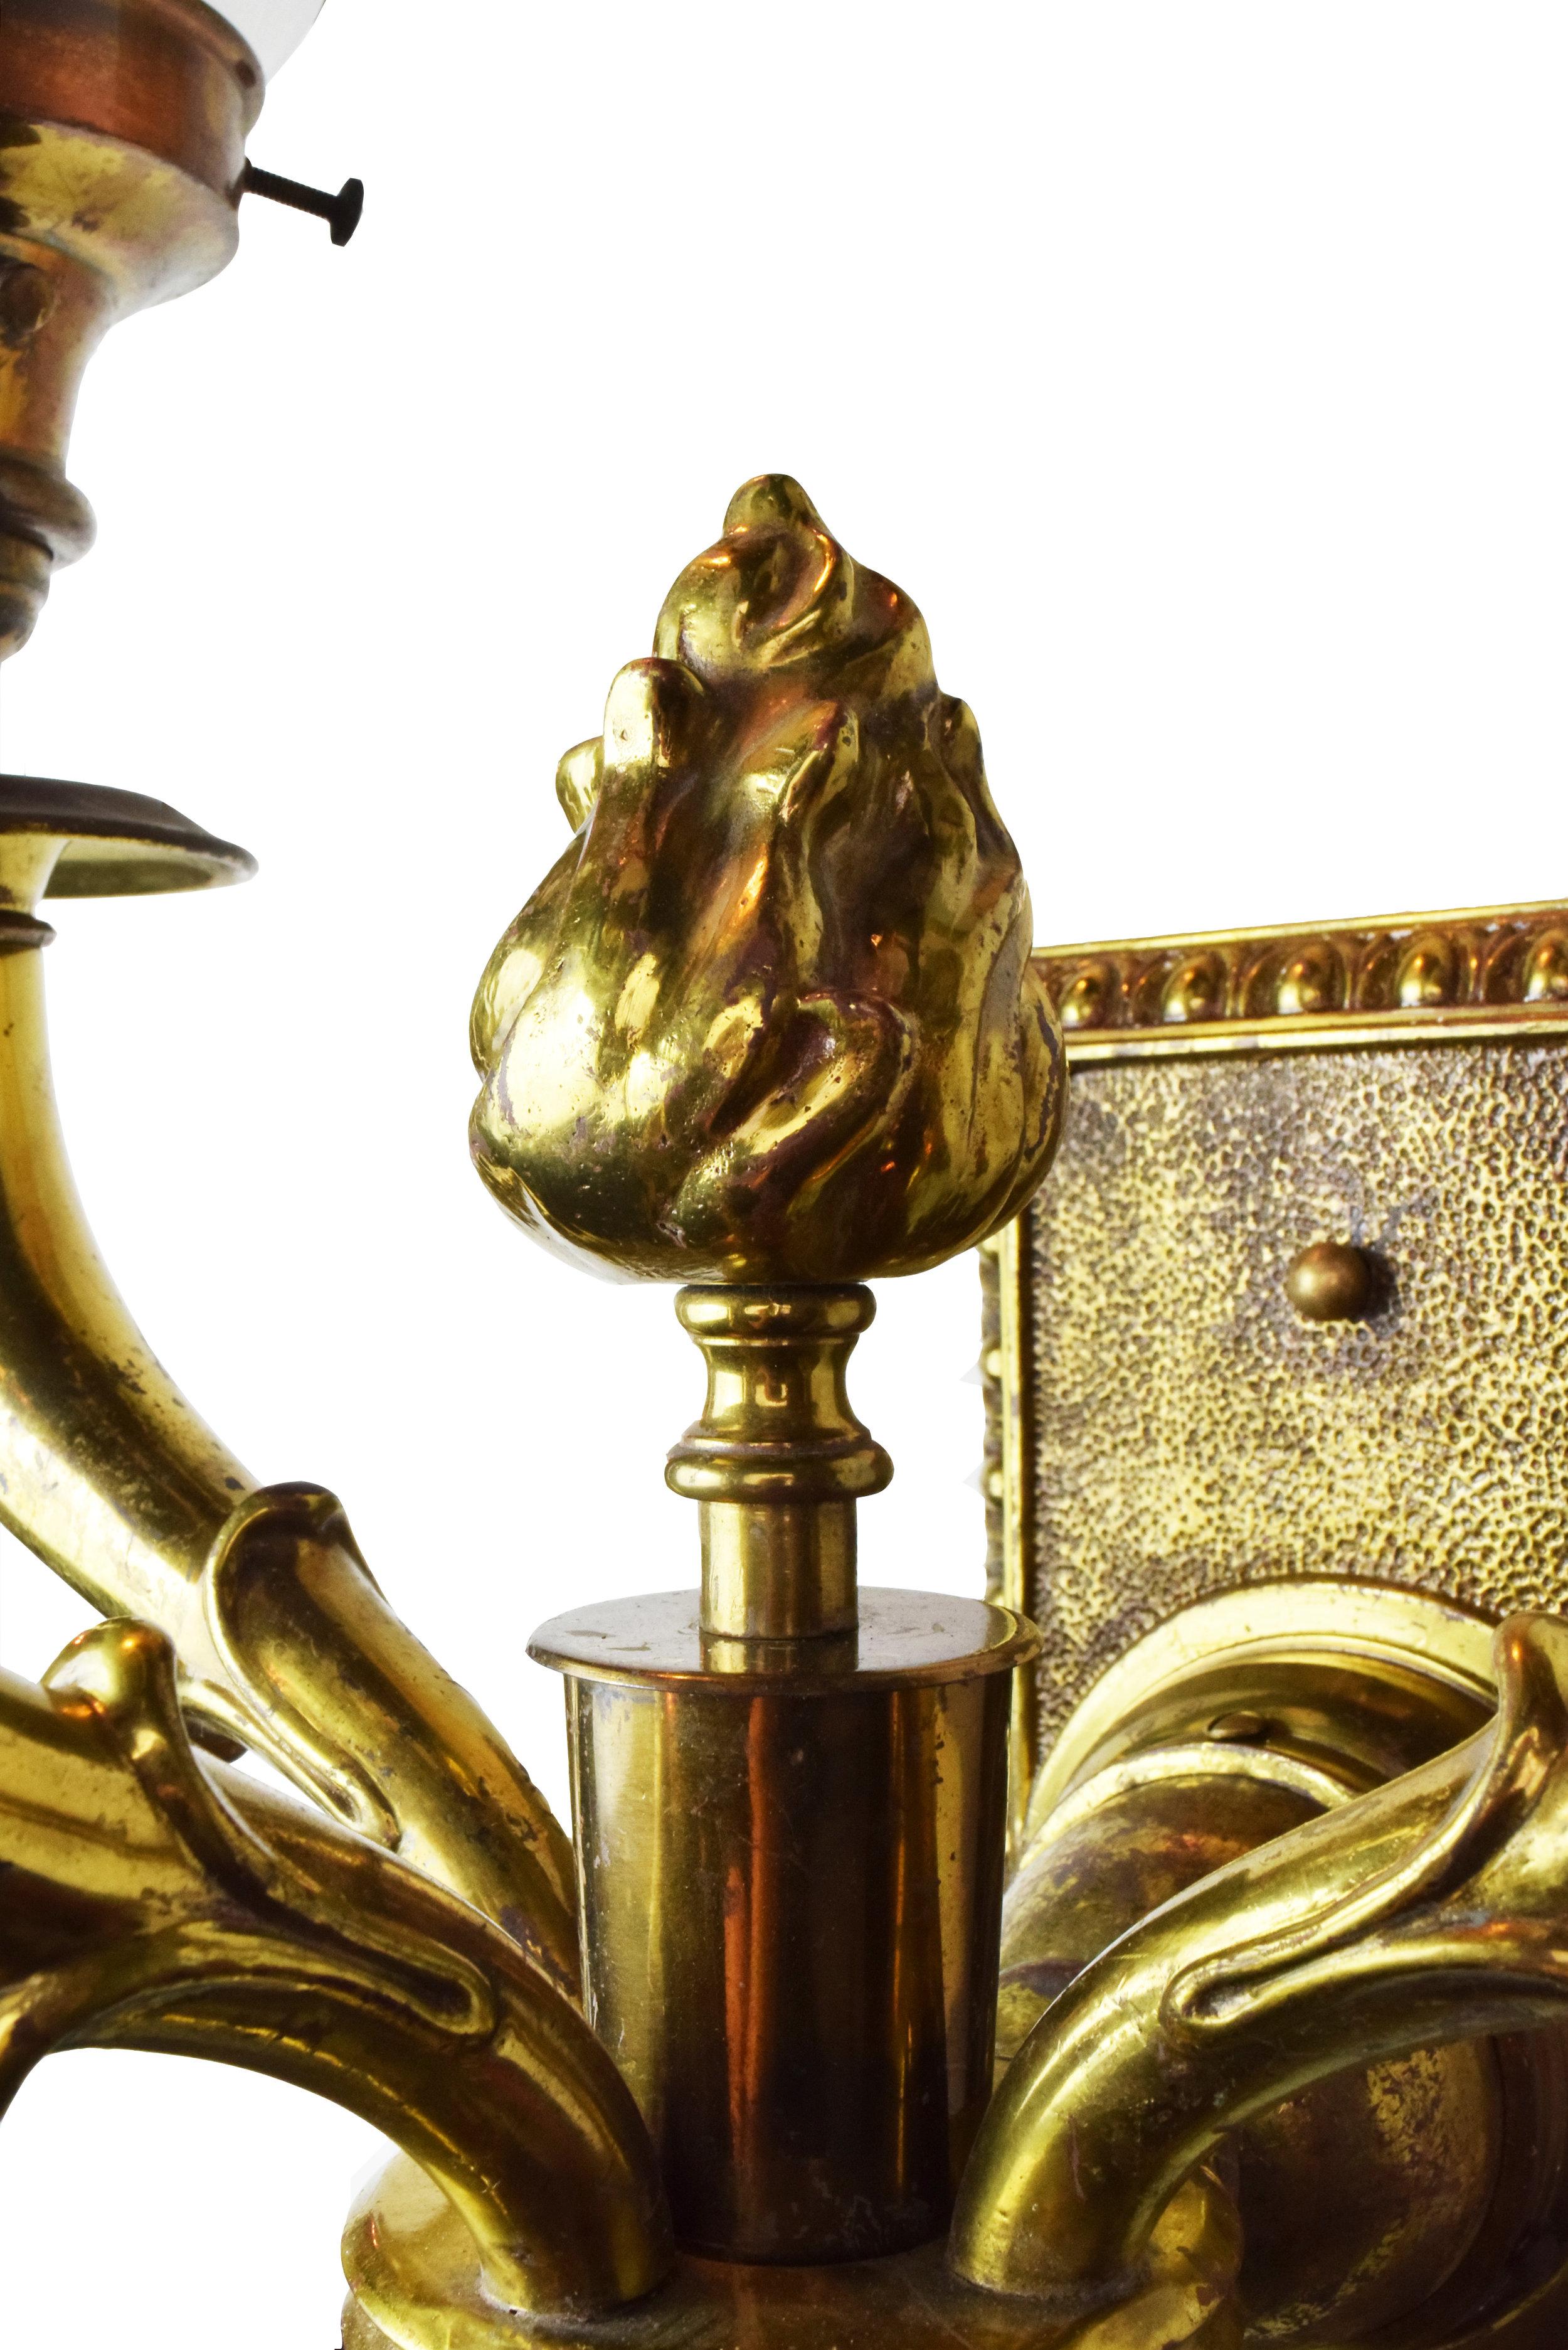 47172-brass-3-arm-ED-sconce-detail-emblem.jpg